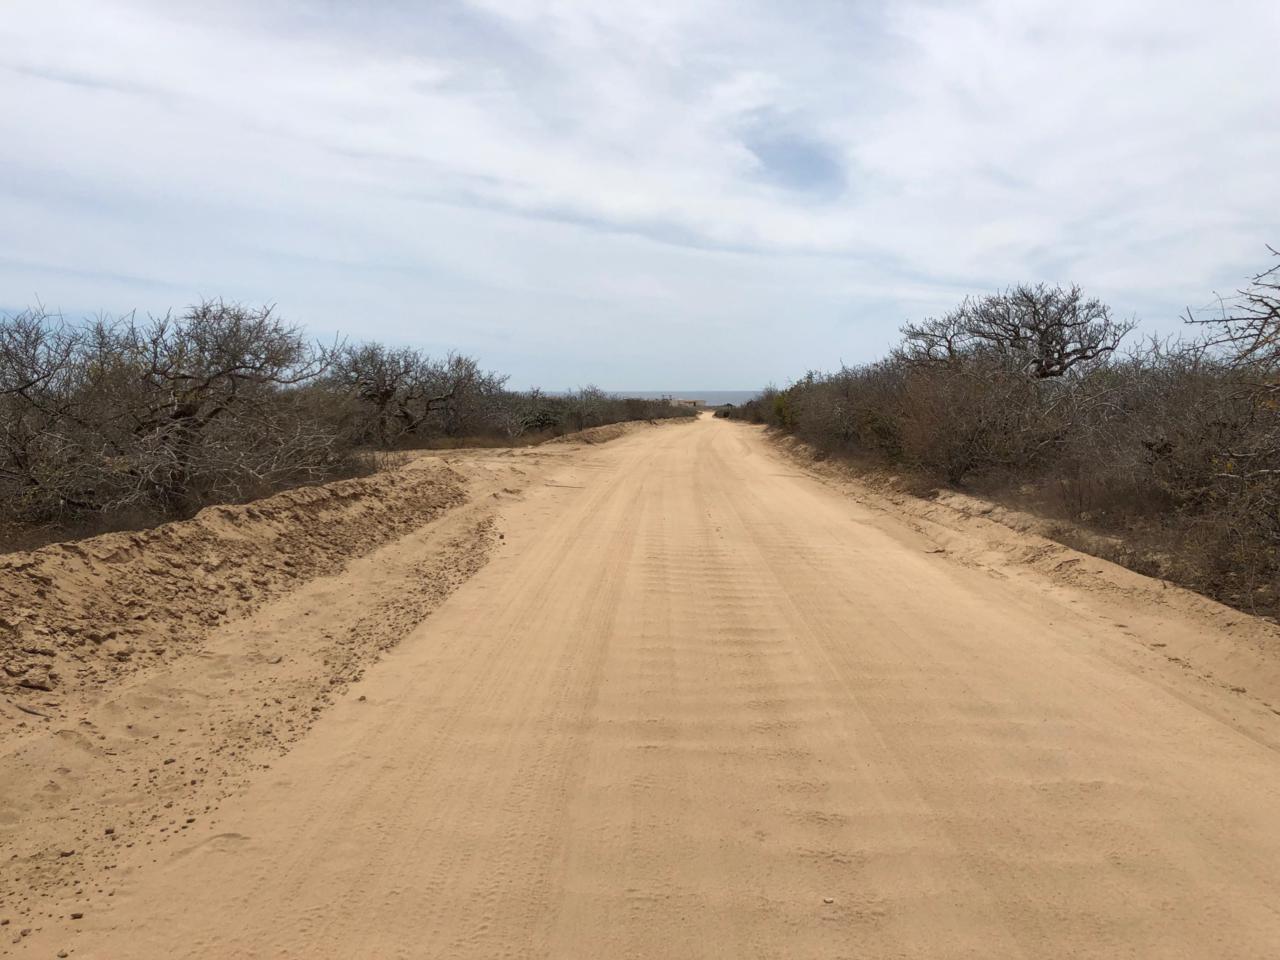 68 Avenida De Las Haciendas Lot 68 Las Haciendas - Photo 1